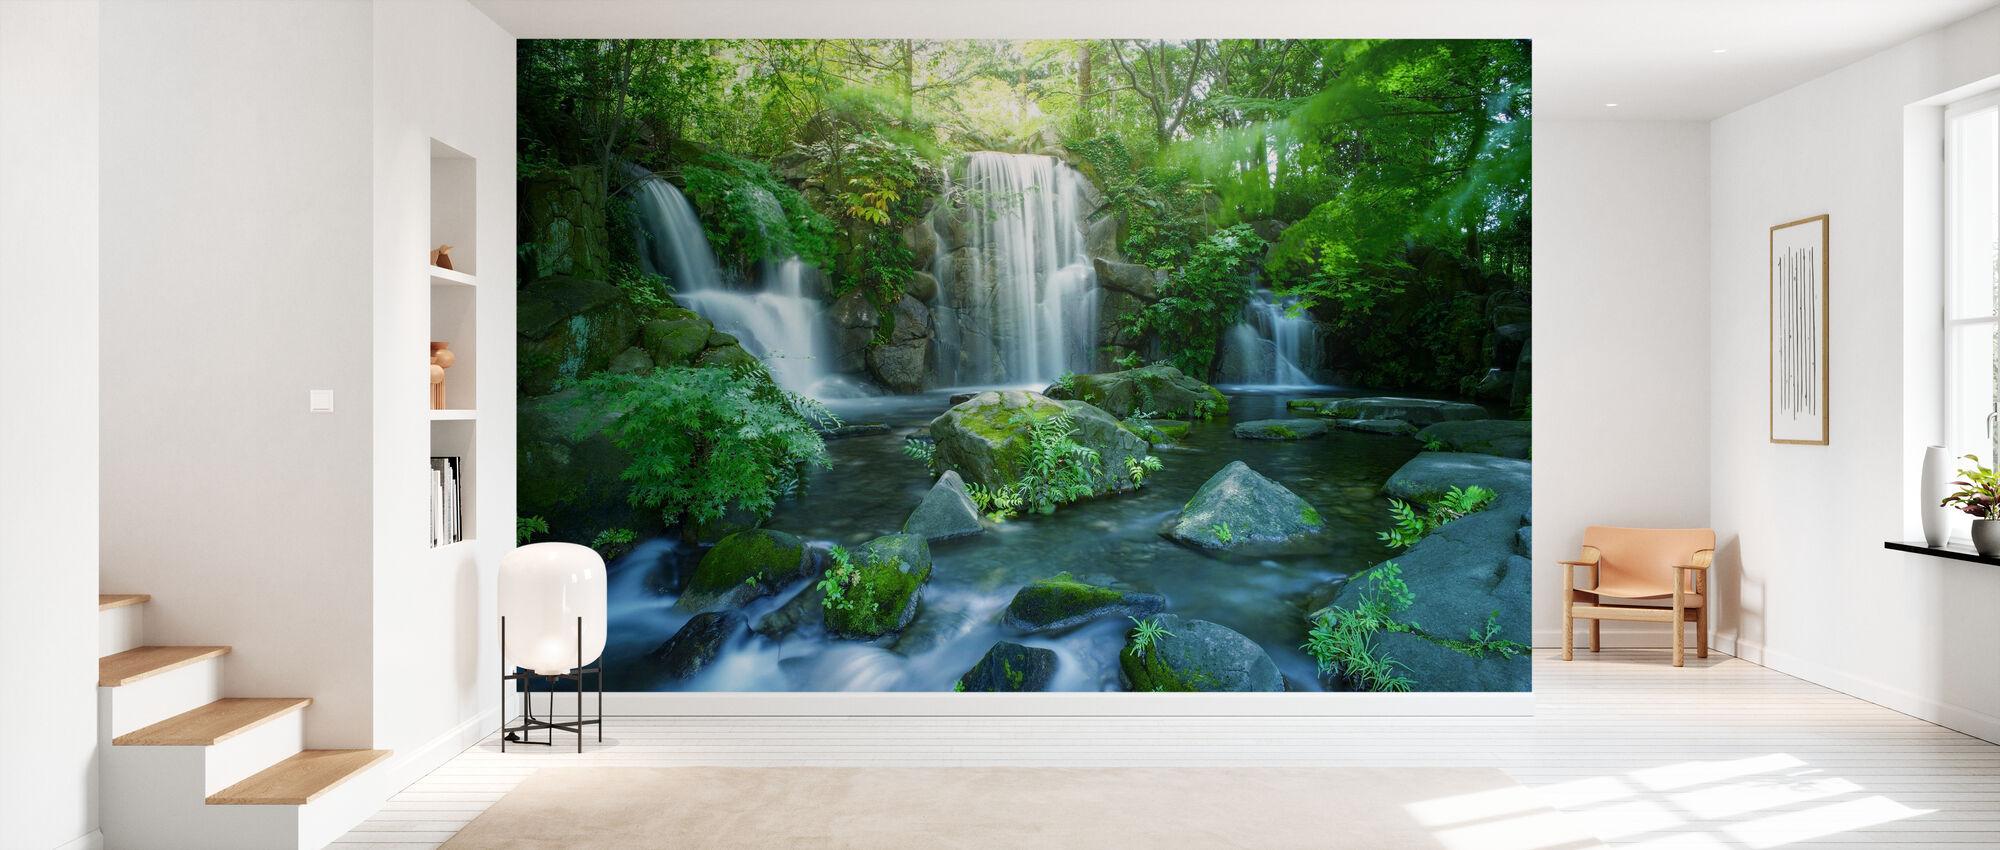 Waterfall in Tokyo - Wallpaper - Hallway